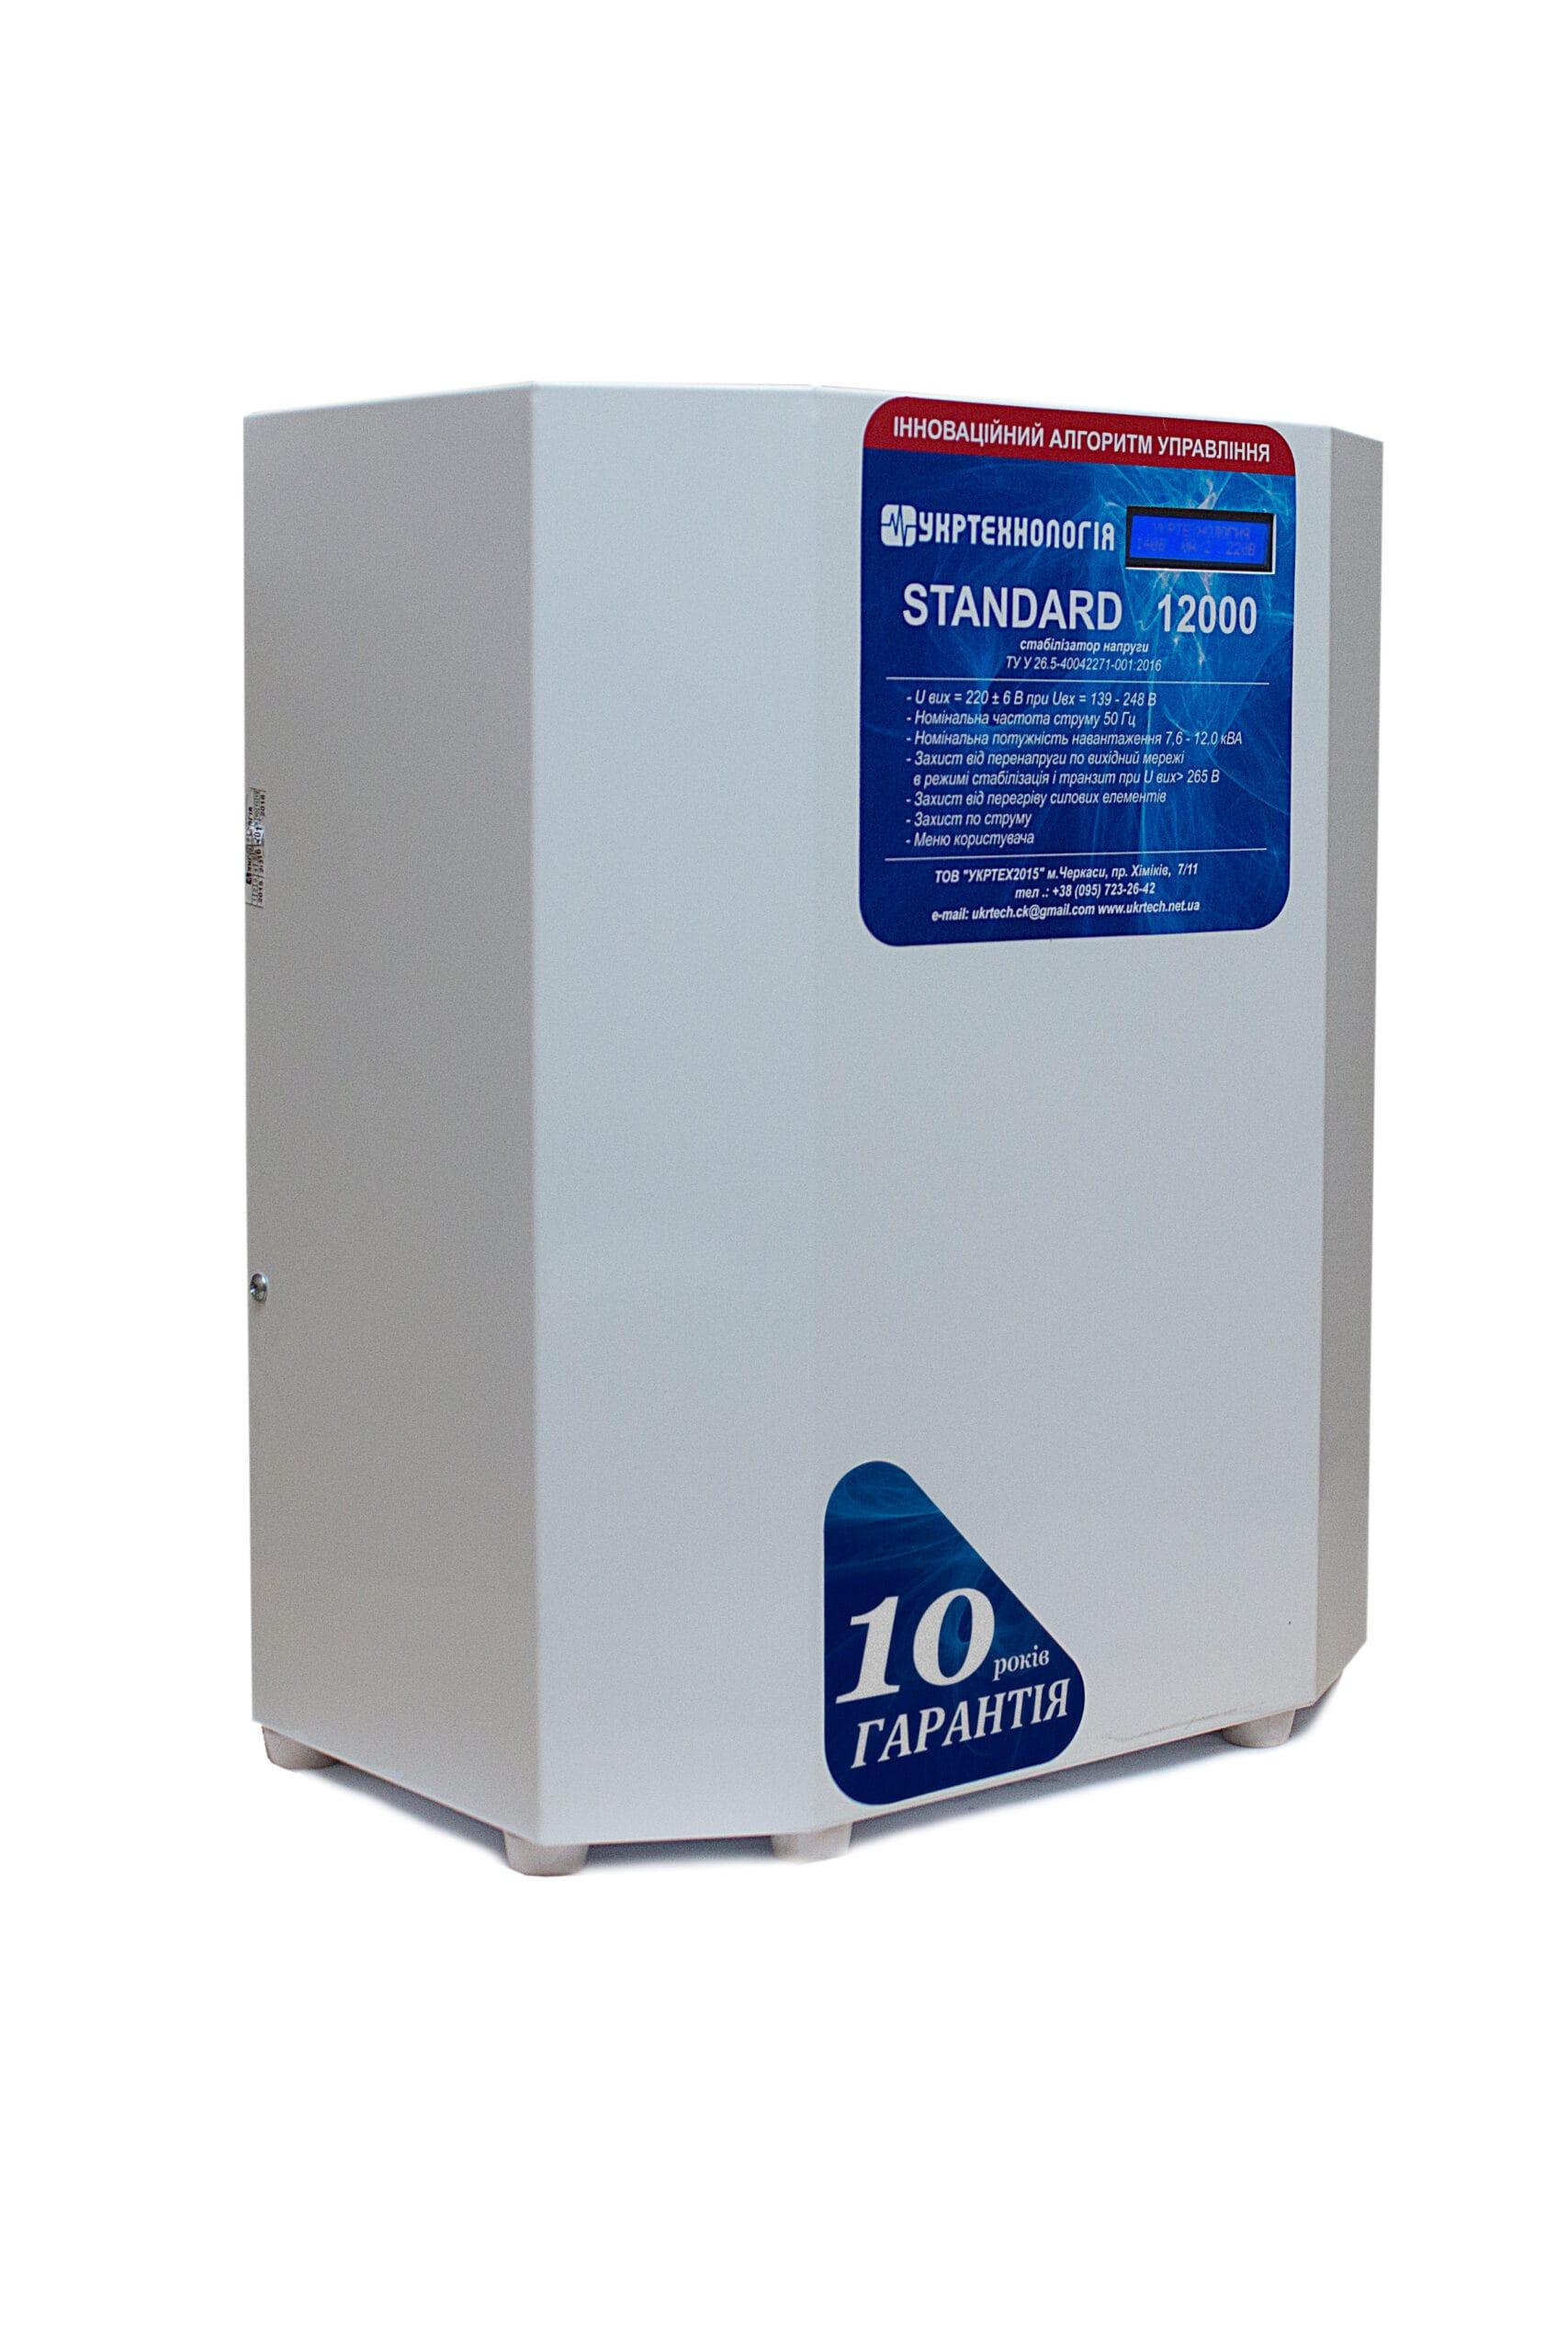 Стабилизаторы напряжения - Стабилизатор напряжения 12 кВт STANDARD  000001399 - Фото 2